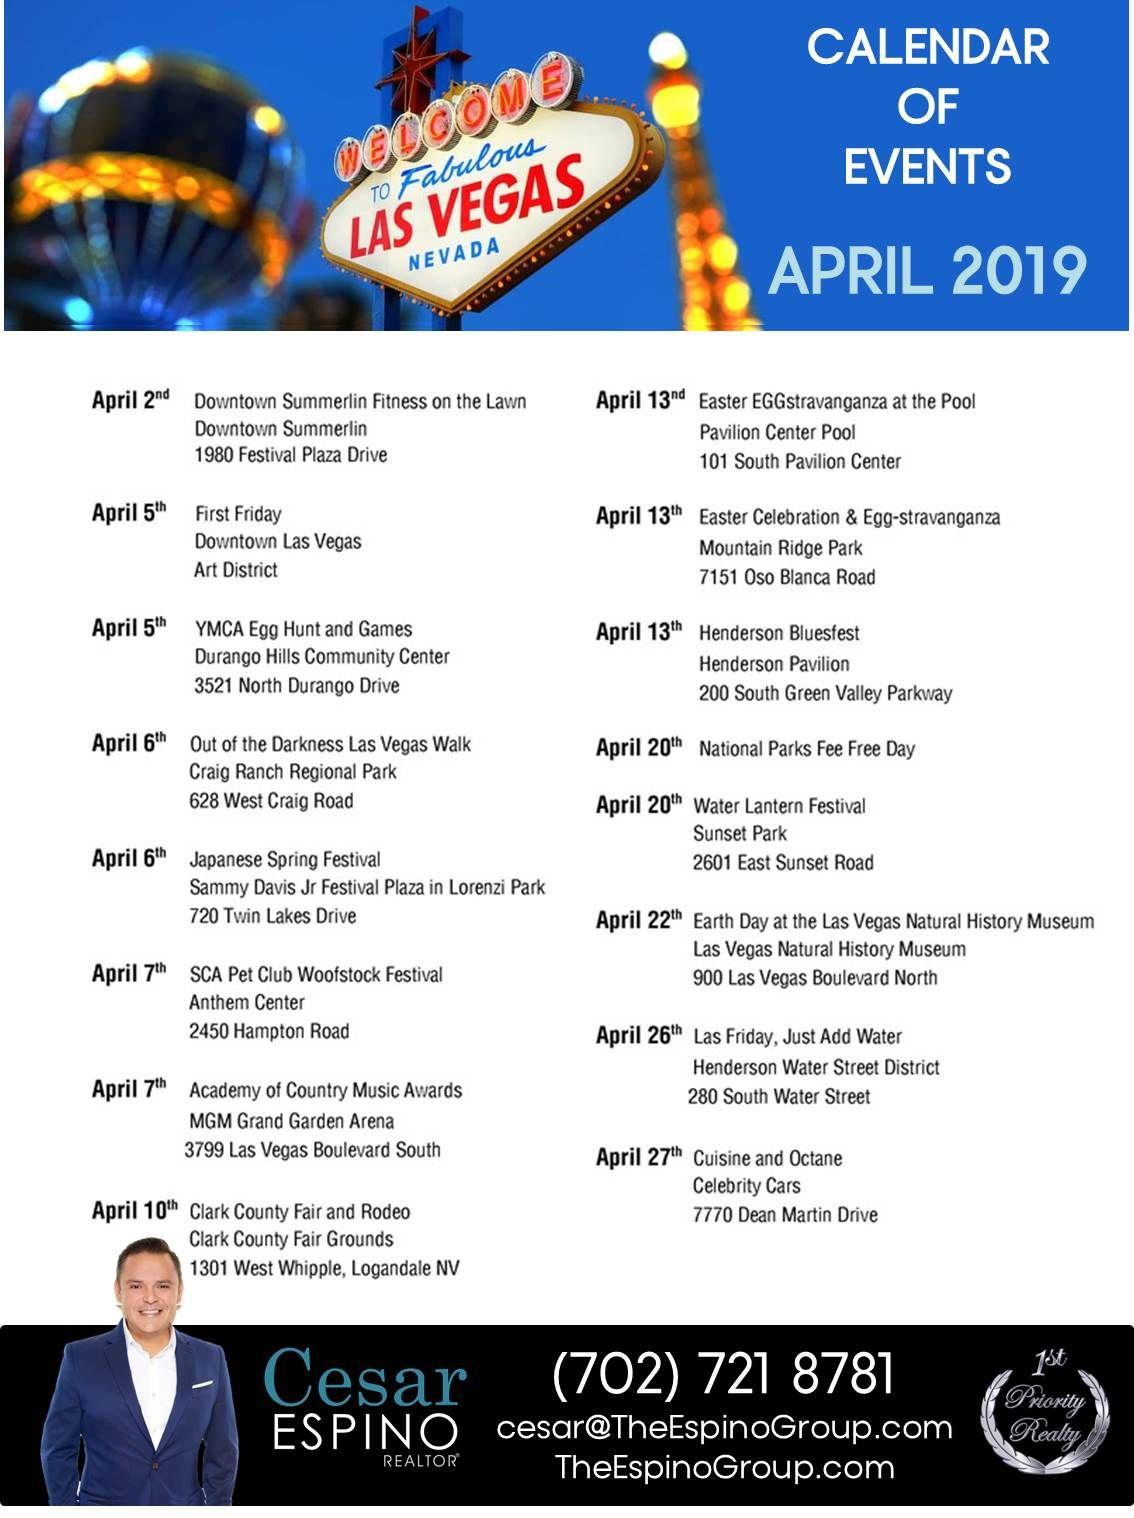 Las Vegas Calendar Of Events 2019 For our Clients in Las Vegas Calendar of Events for April 2019